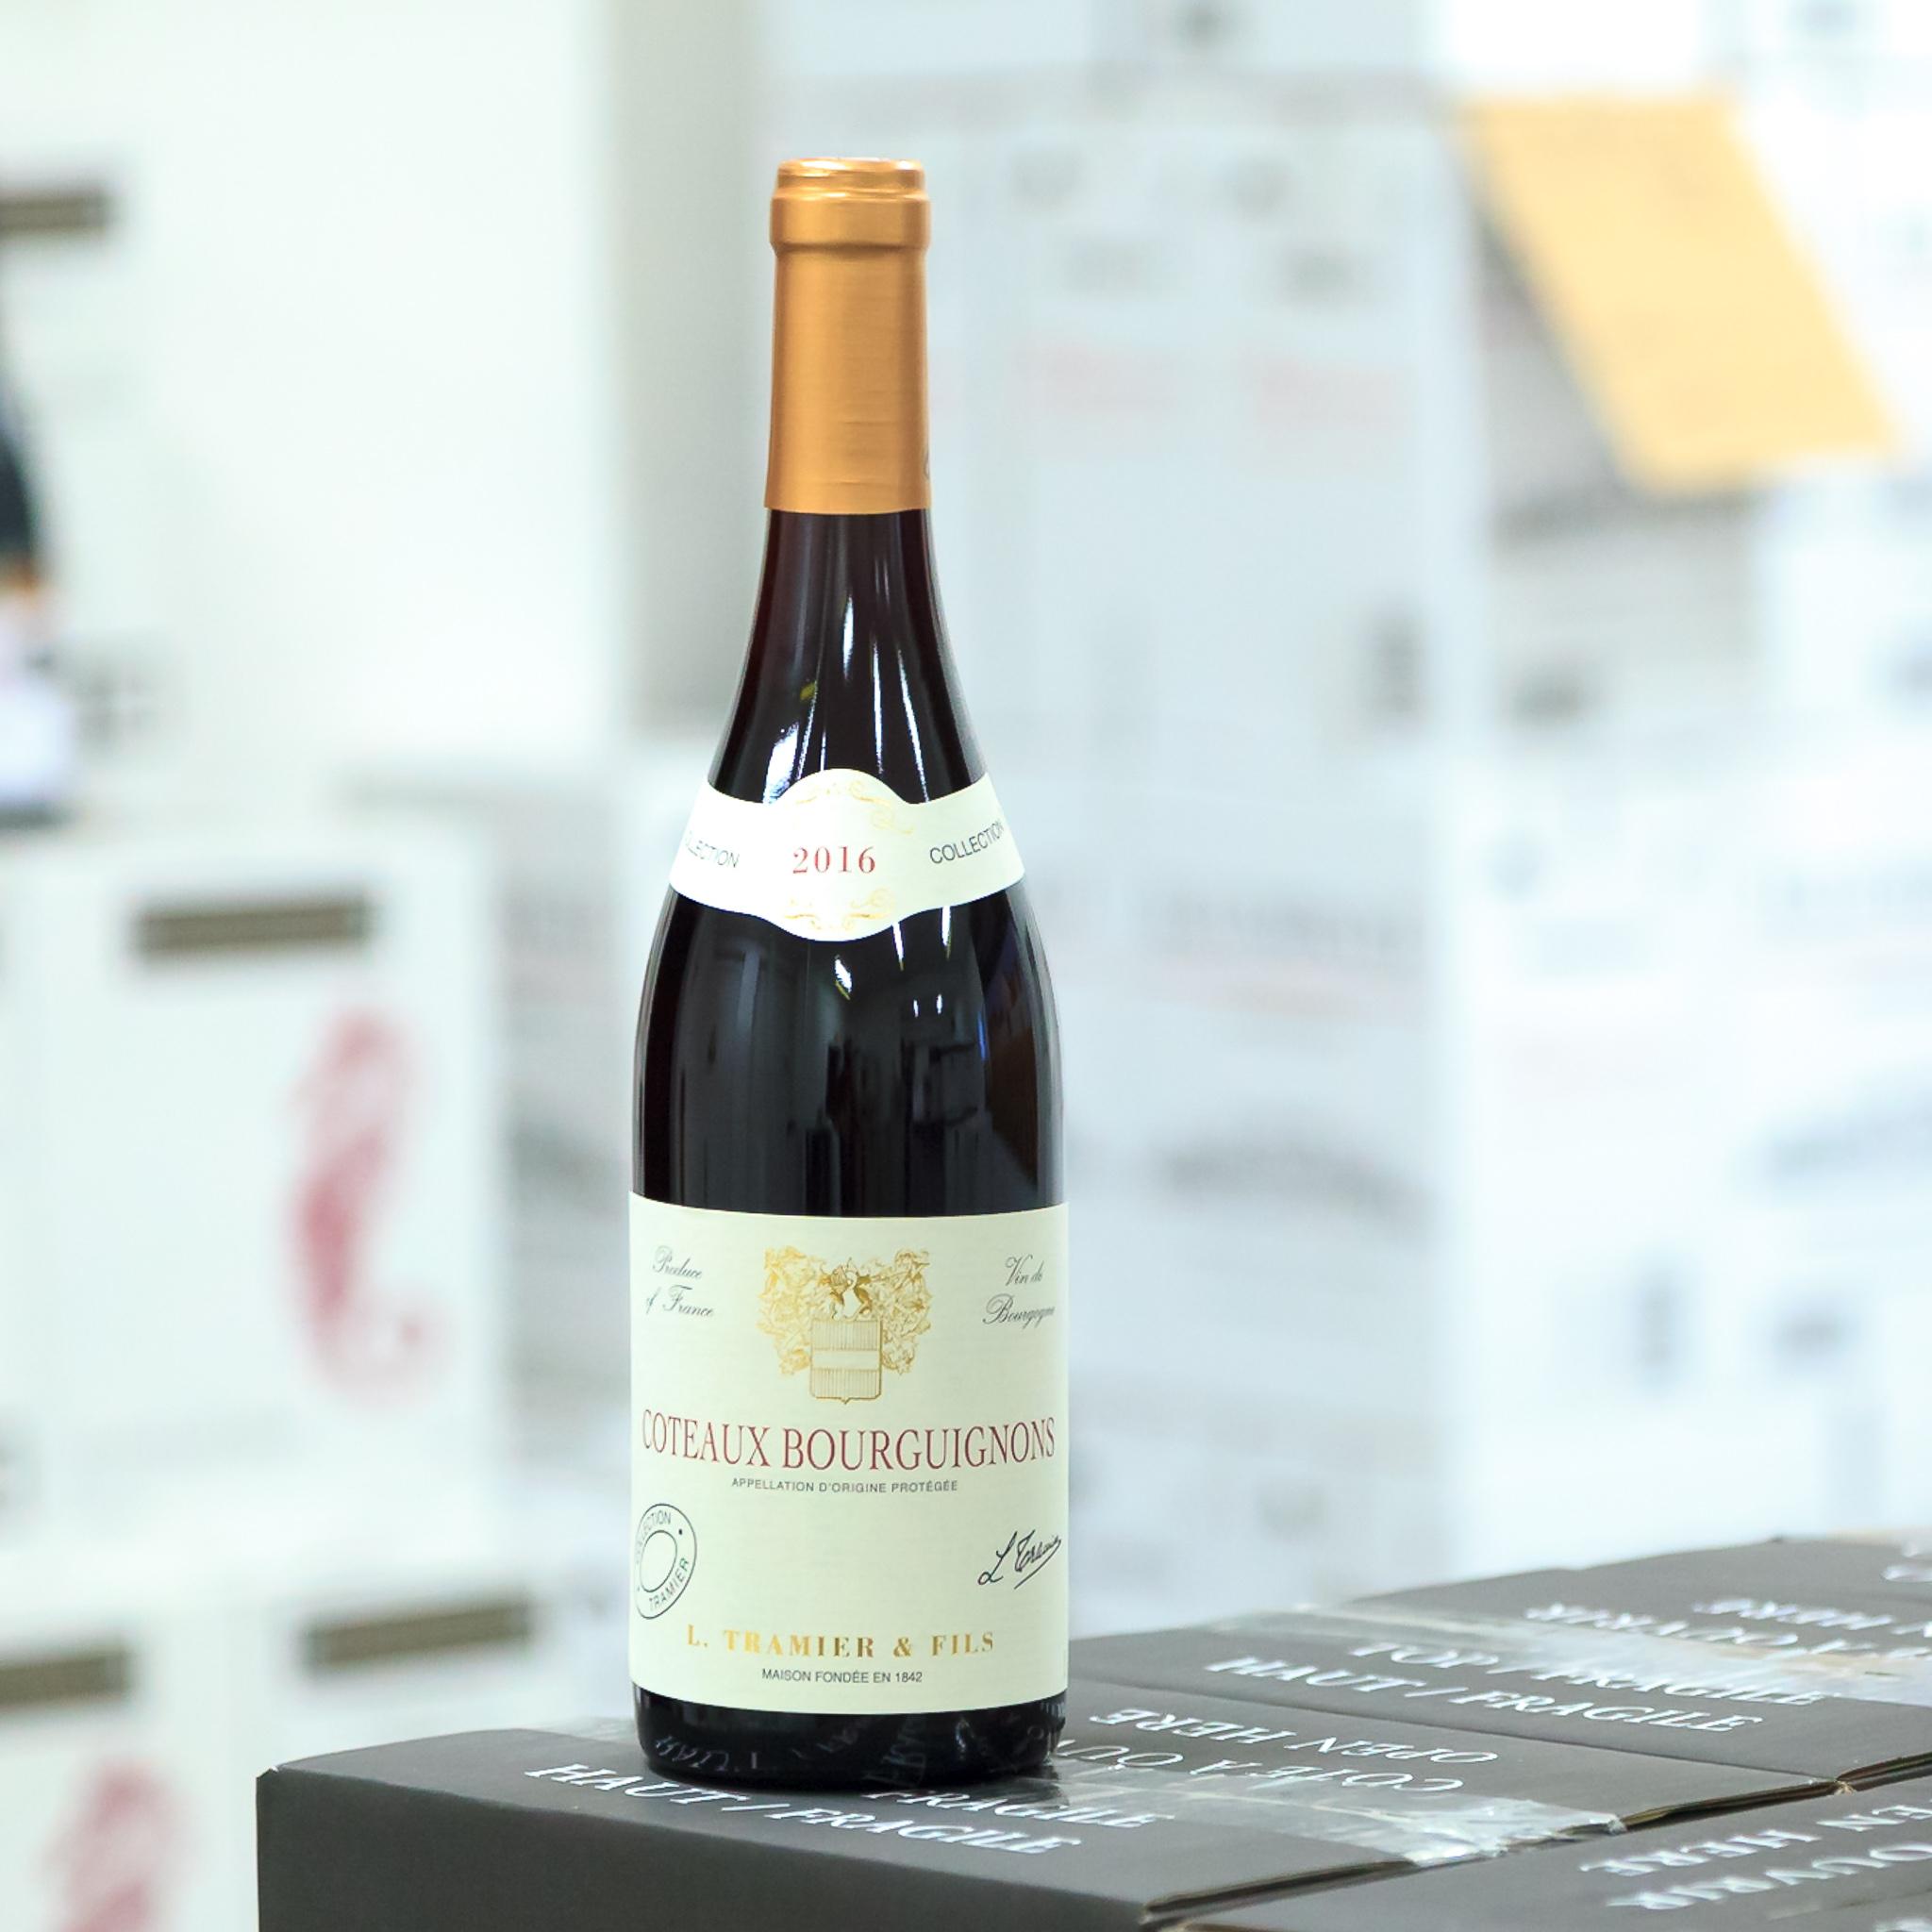 Cotes Bourguignons - Cotes Bourguignons je jediná Burgundská apelace, kde najdete vína Cuvée.- Bílé Cotes Bourguignons: 90% Chardonnay +10% Aligoté-Červené Cotes Bourguignons: 85% Gamay + 15% Pinot Noir